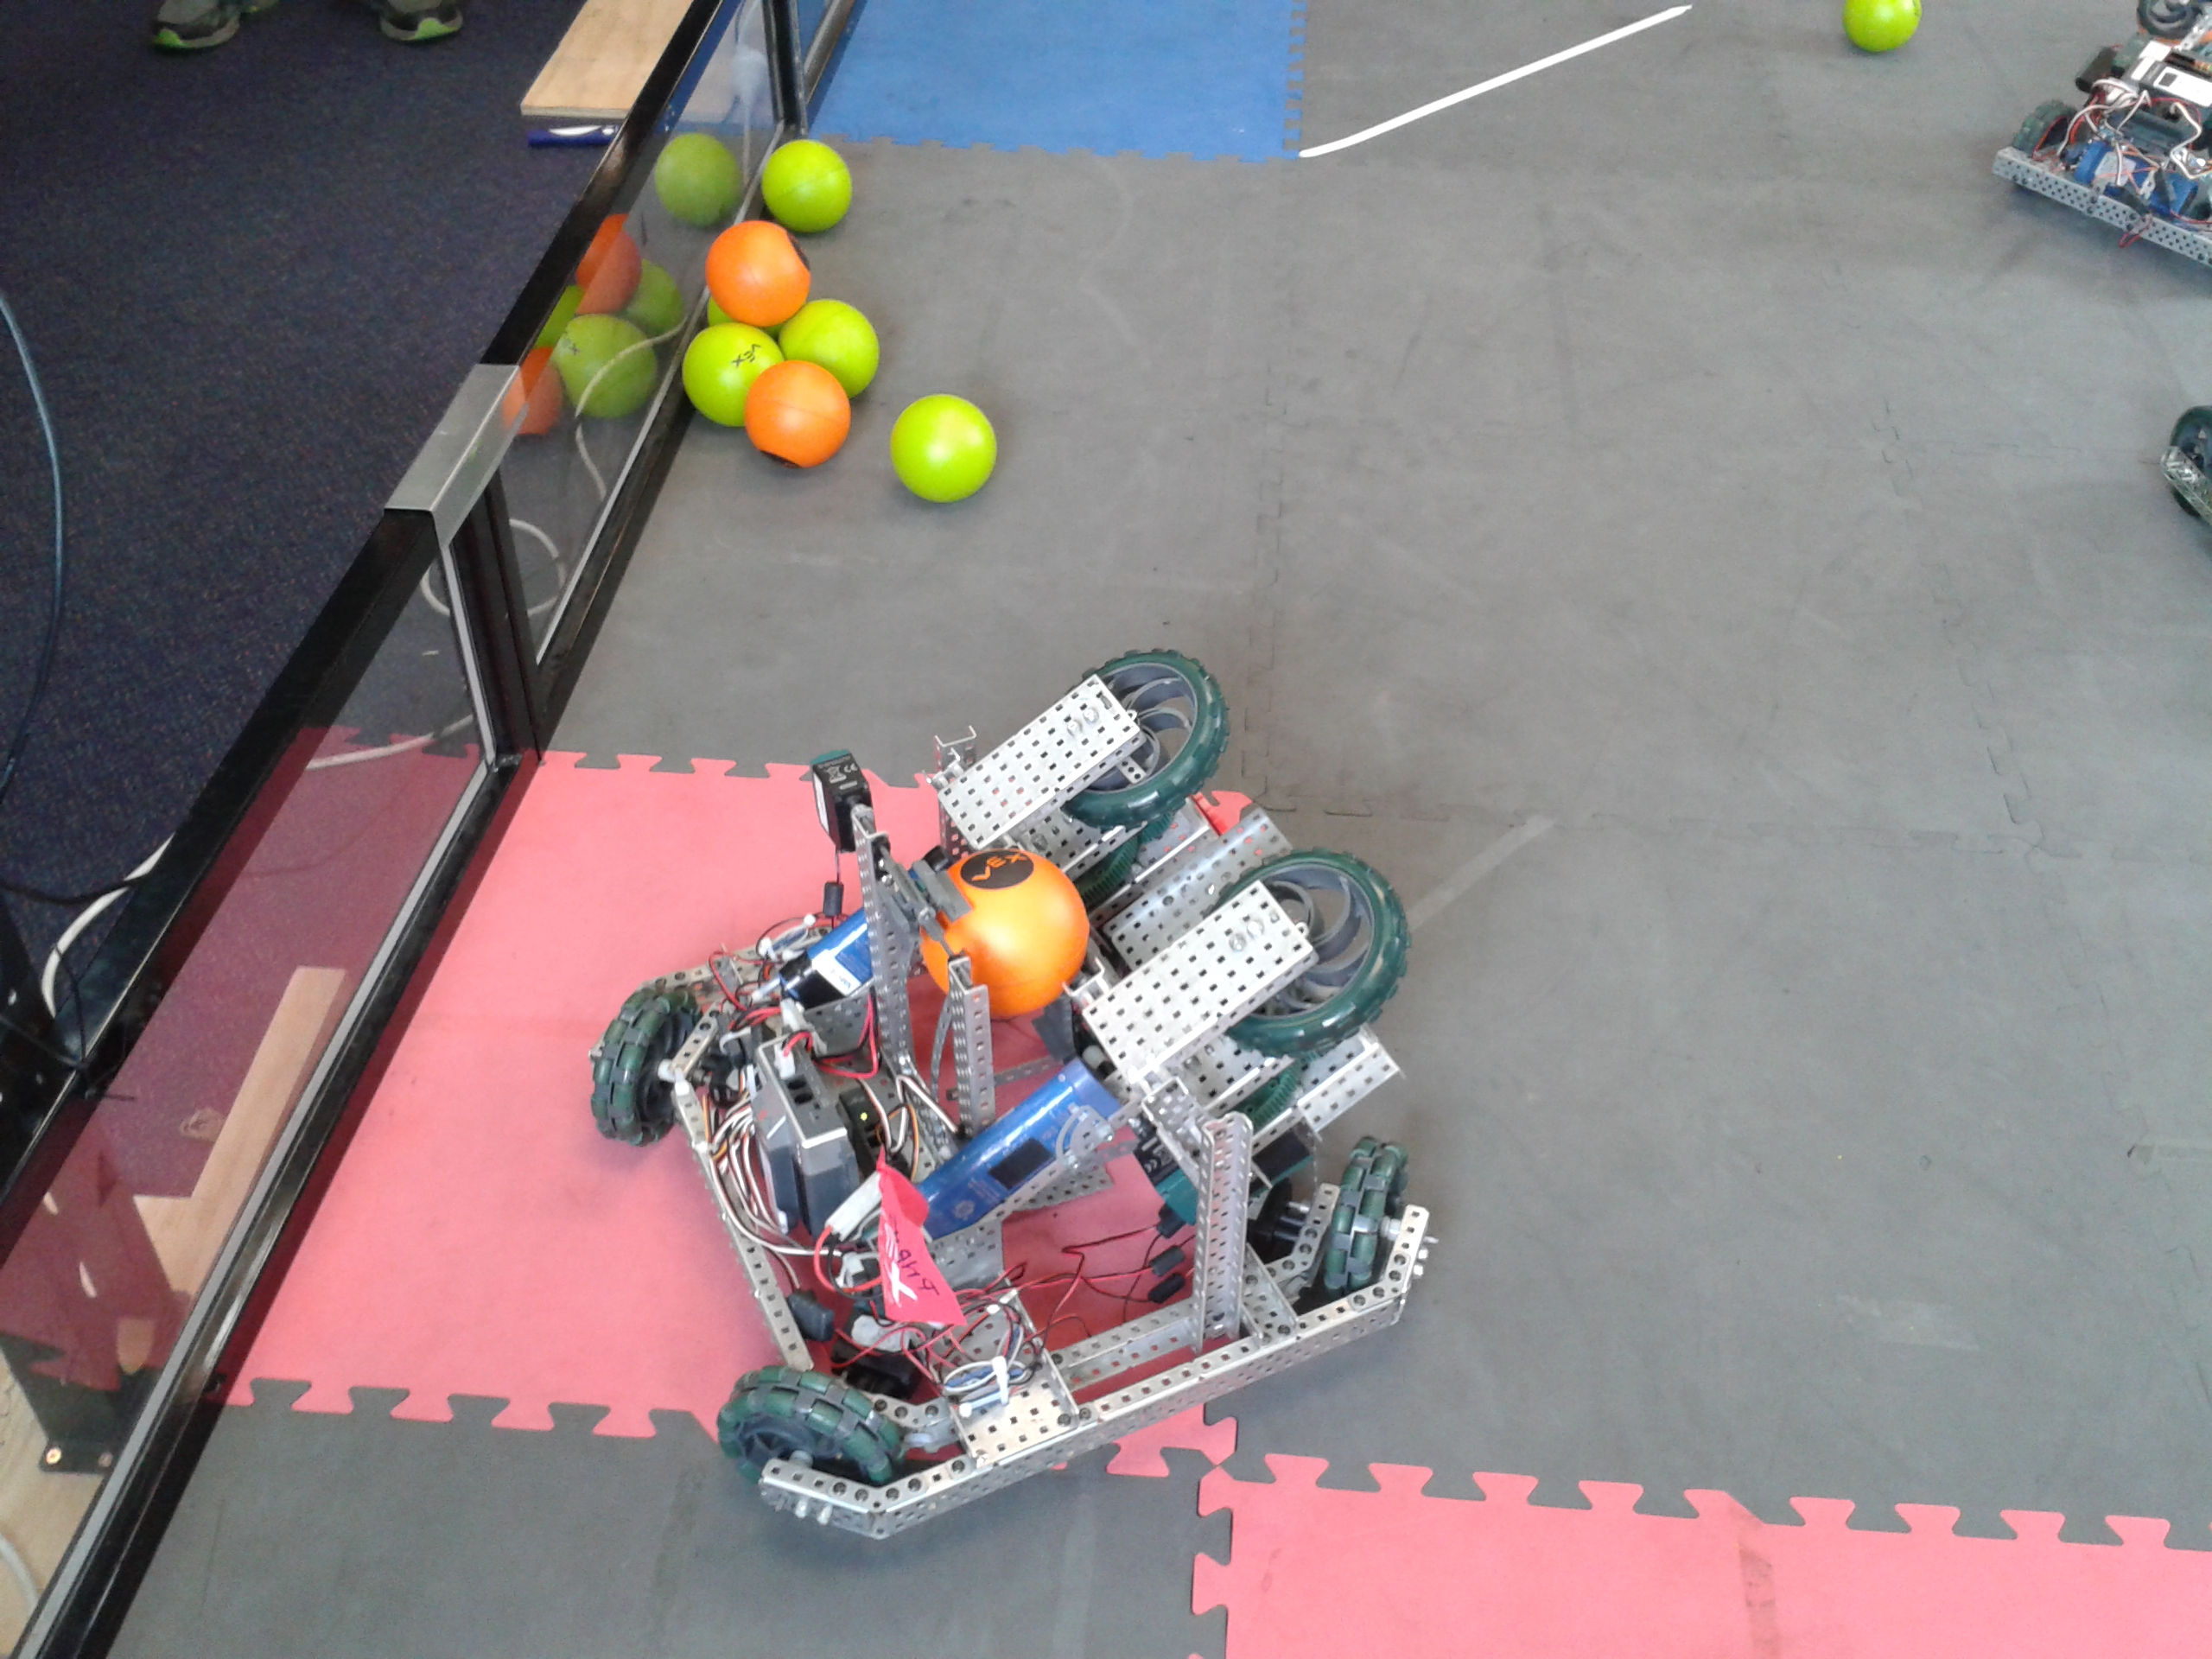 Course: Vex Robotics